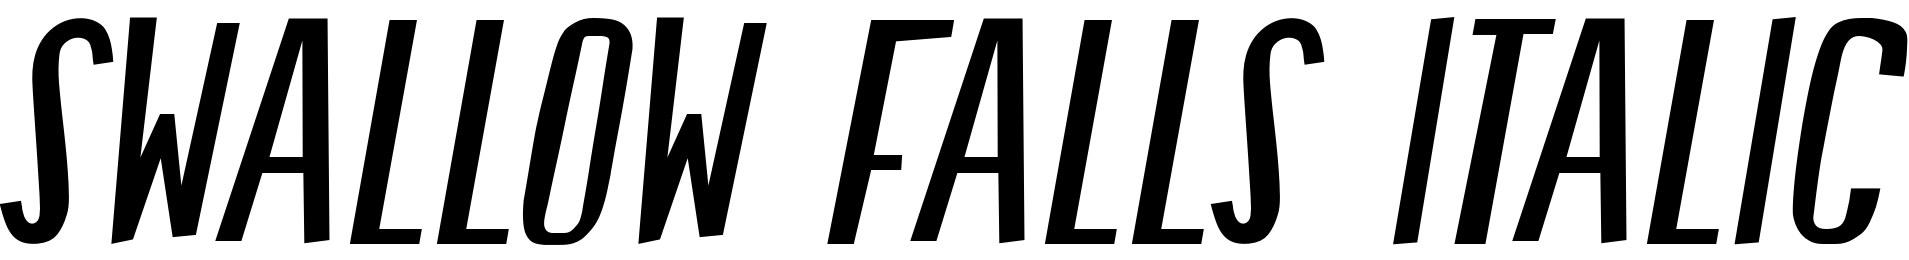 Swallow Falls Italic